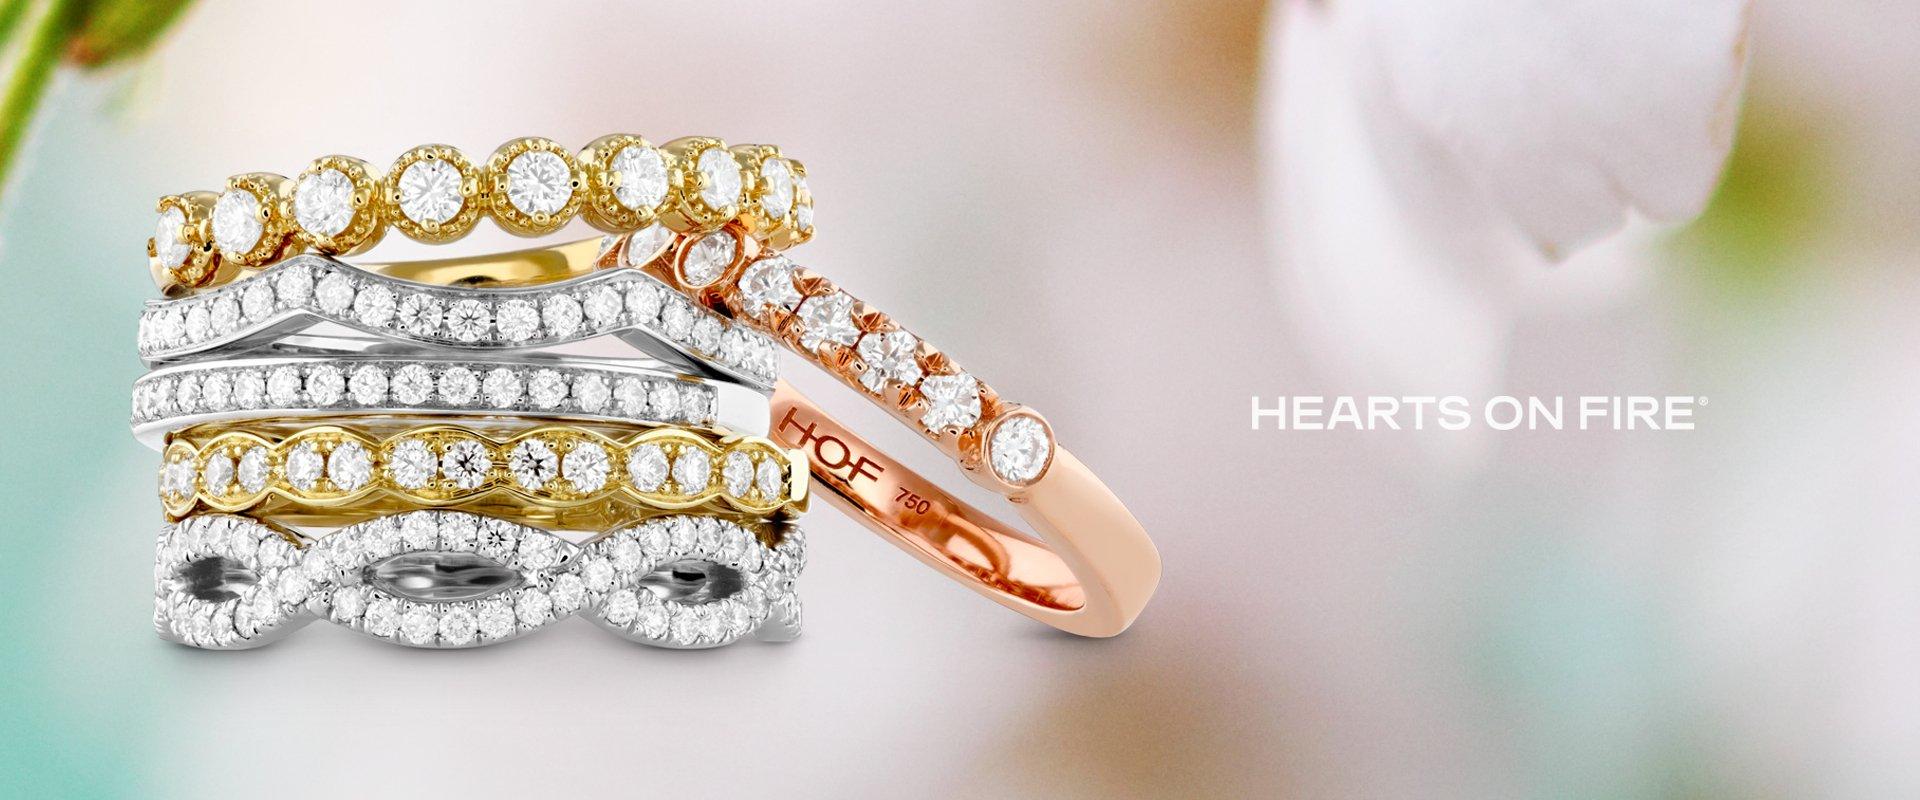 Meyers Jewelers | Grove City, Ohio